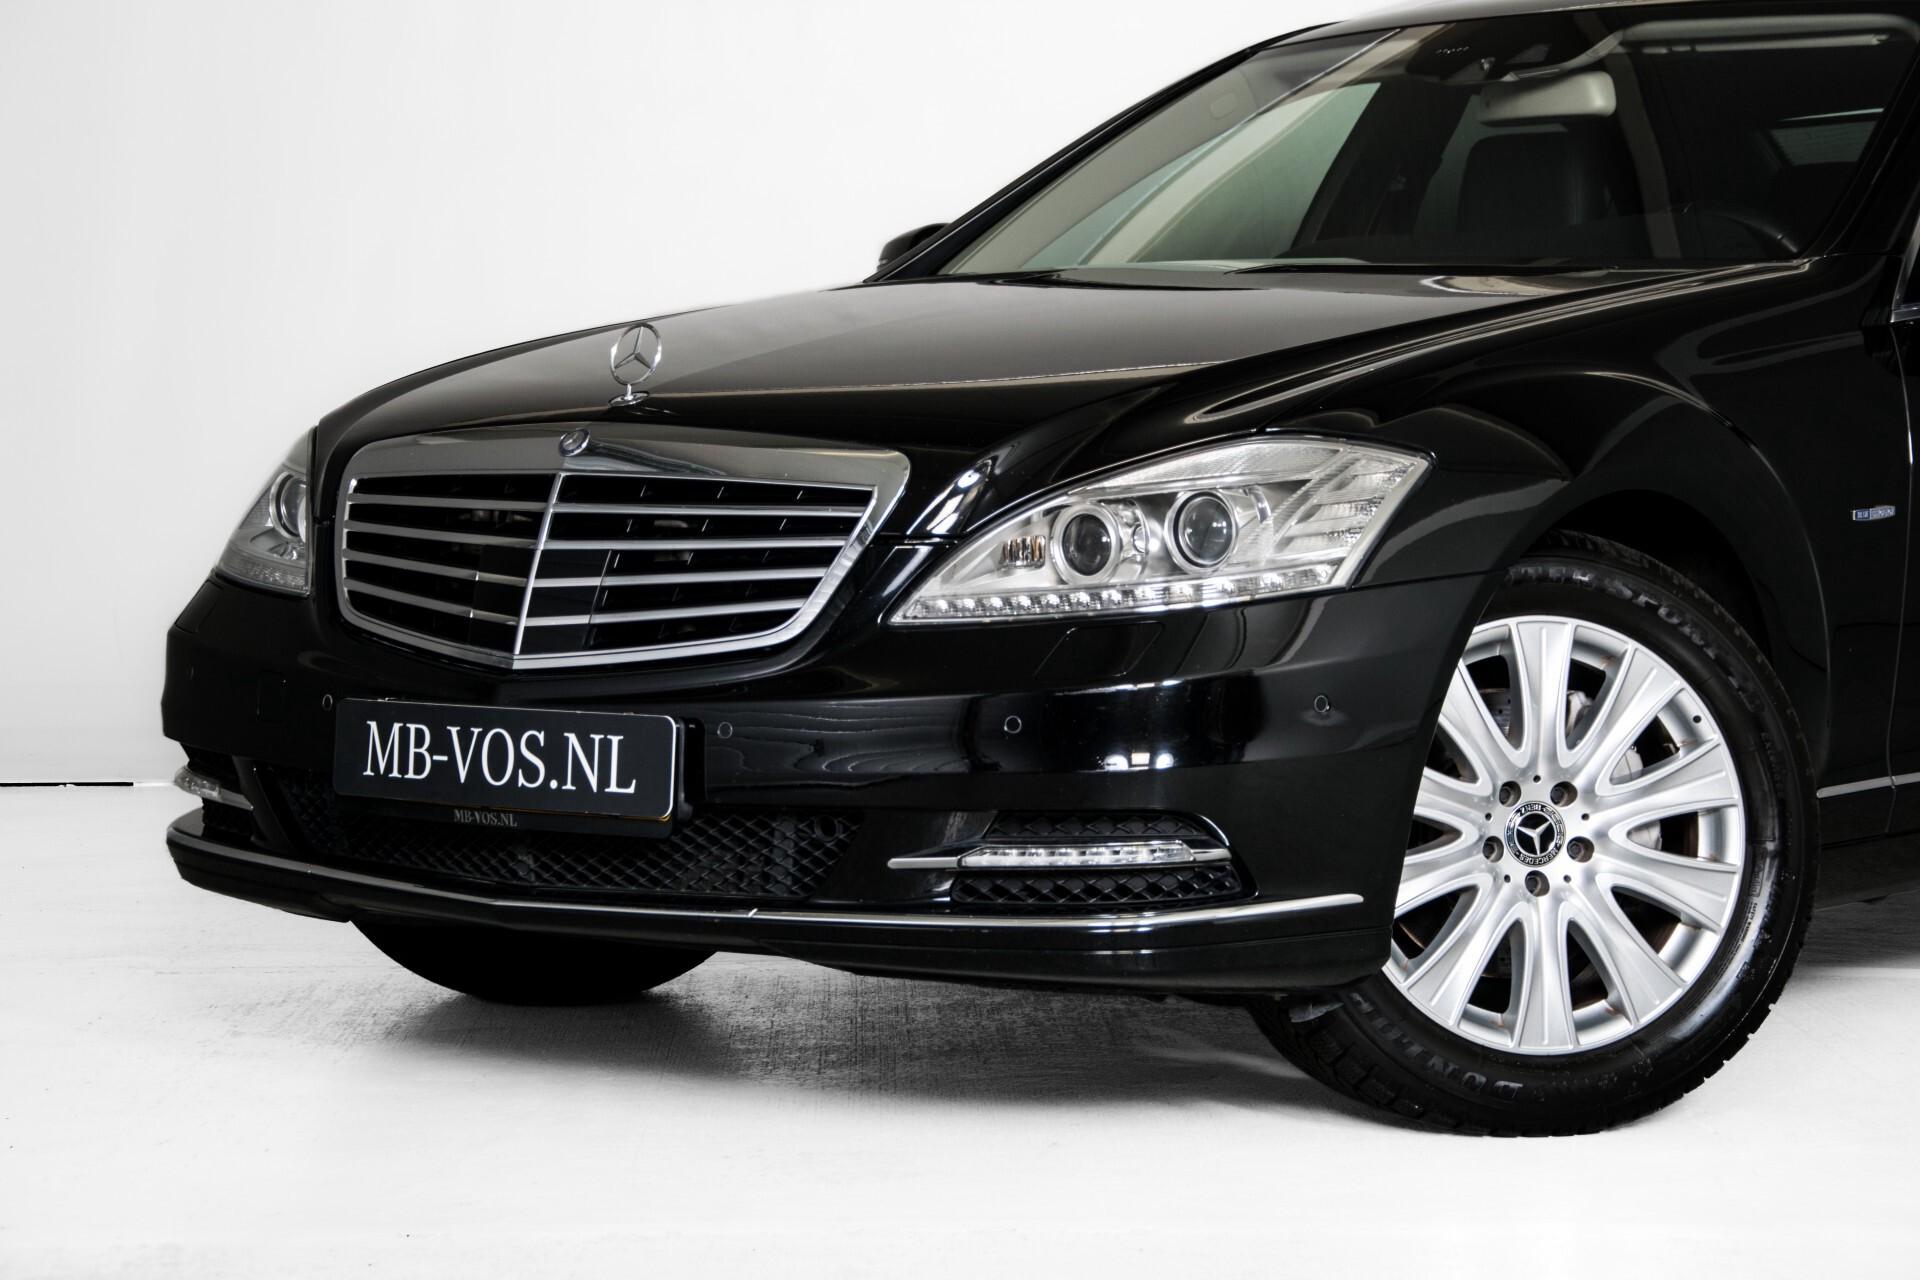 Mercedes-Benz S-Klasse 350 Bluetec Keyless/Distronic/Nightvision/Schuifdak/Harman-Kardon Aut7 Foto 65